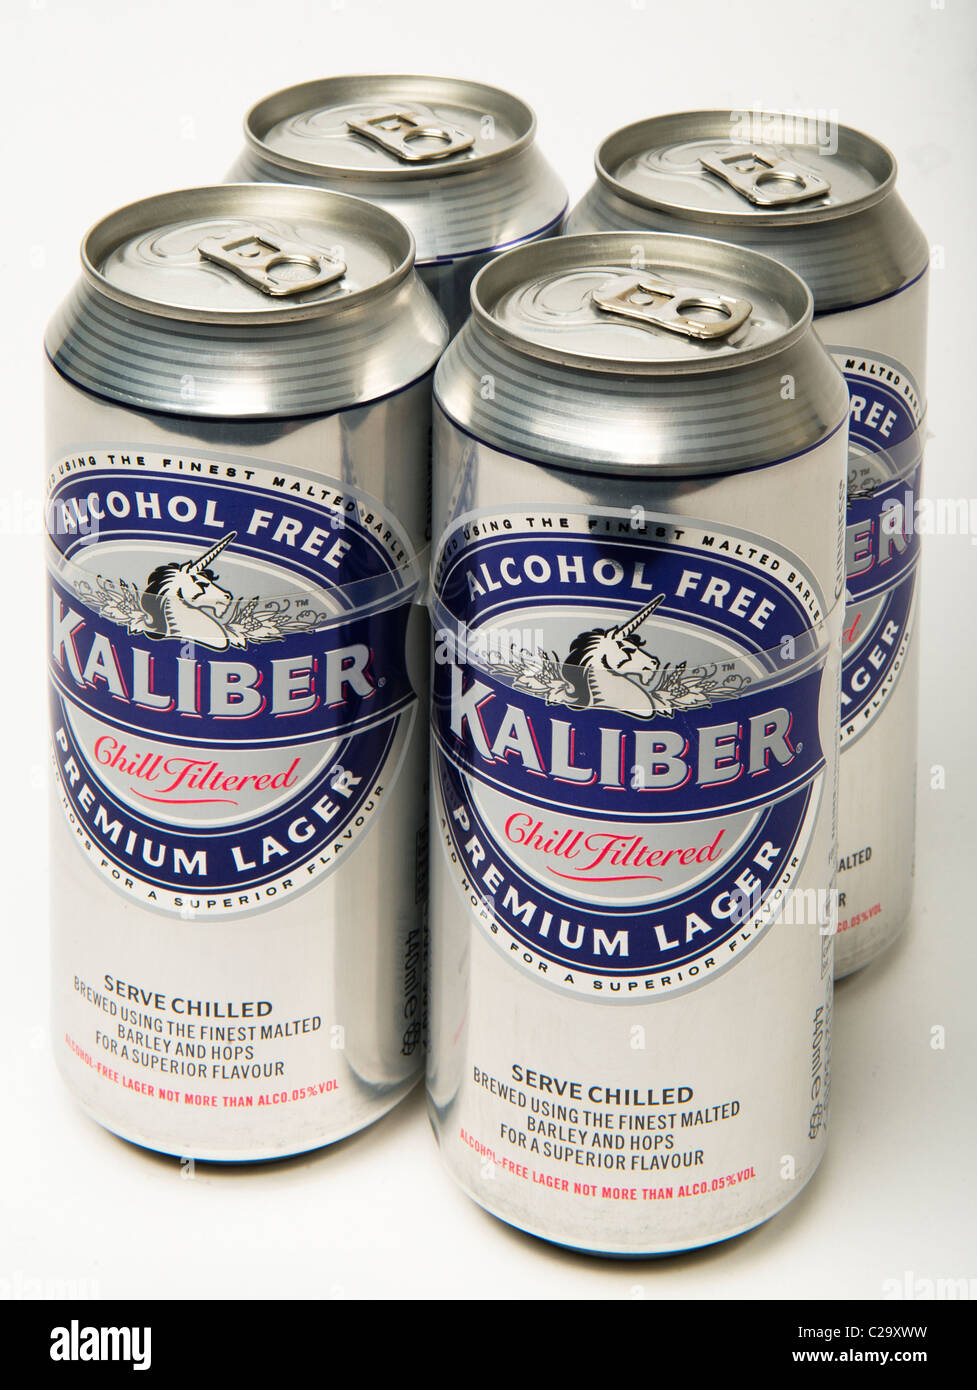 Kaliber sin alcohol 0% mayores Imagen De Stock